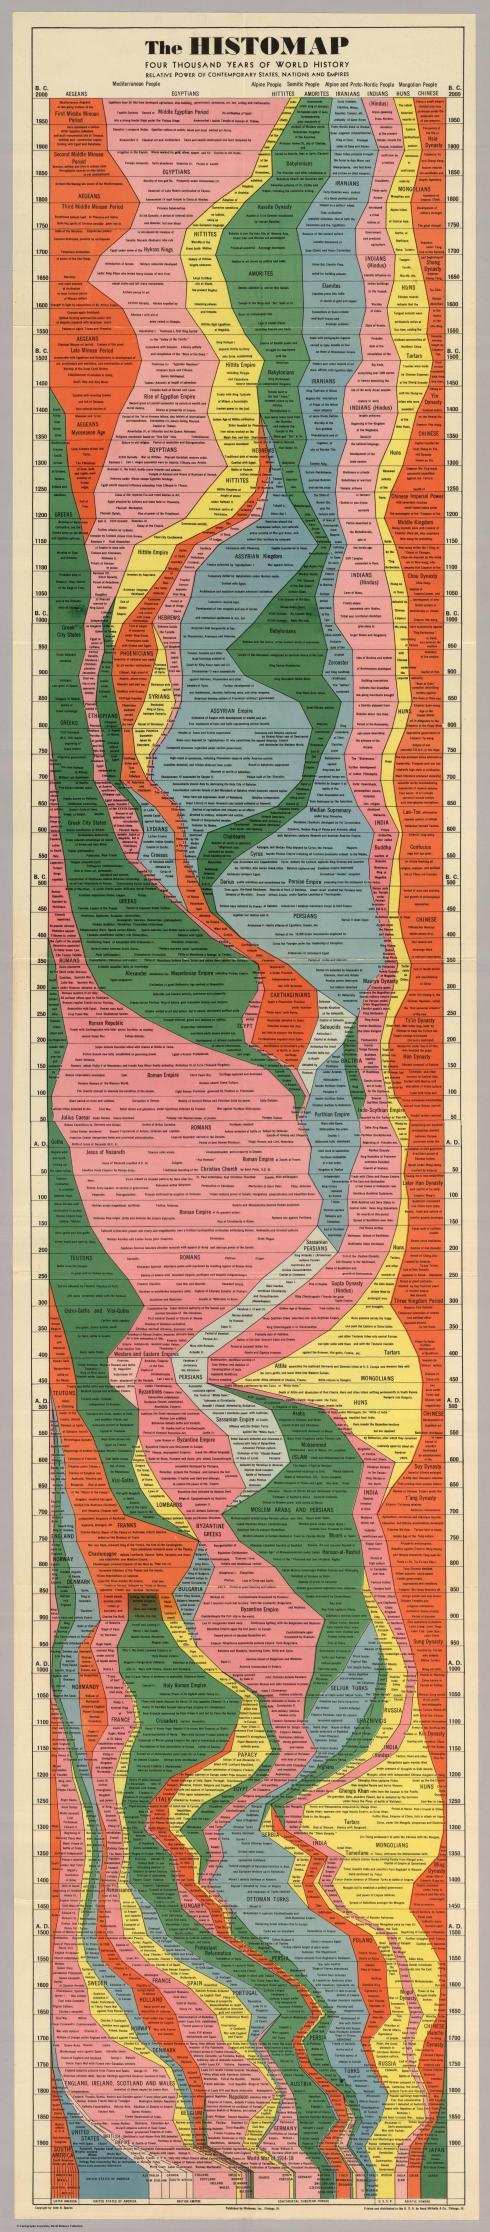 4,000 Years of Human History (1931)